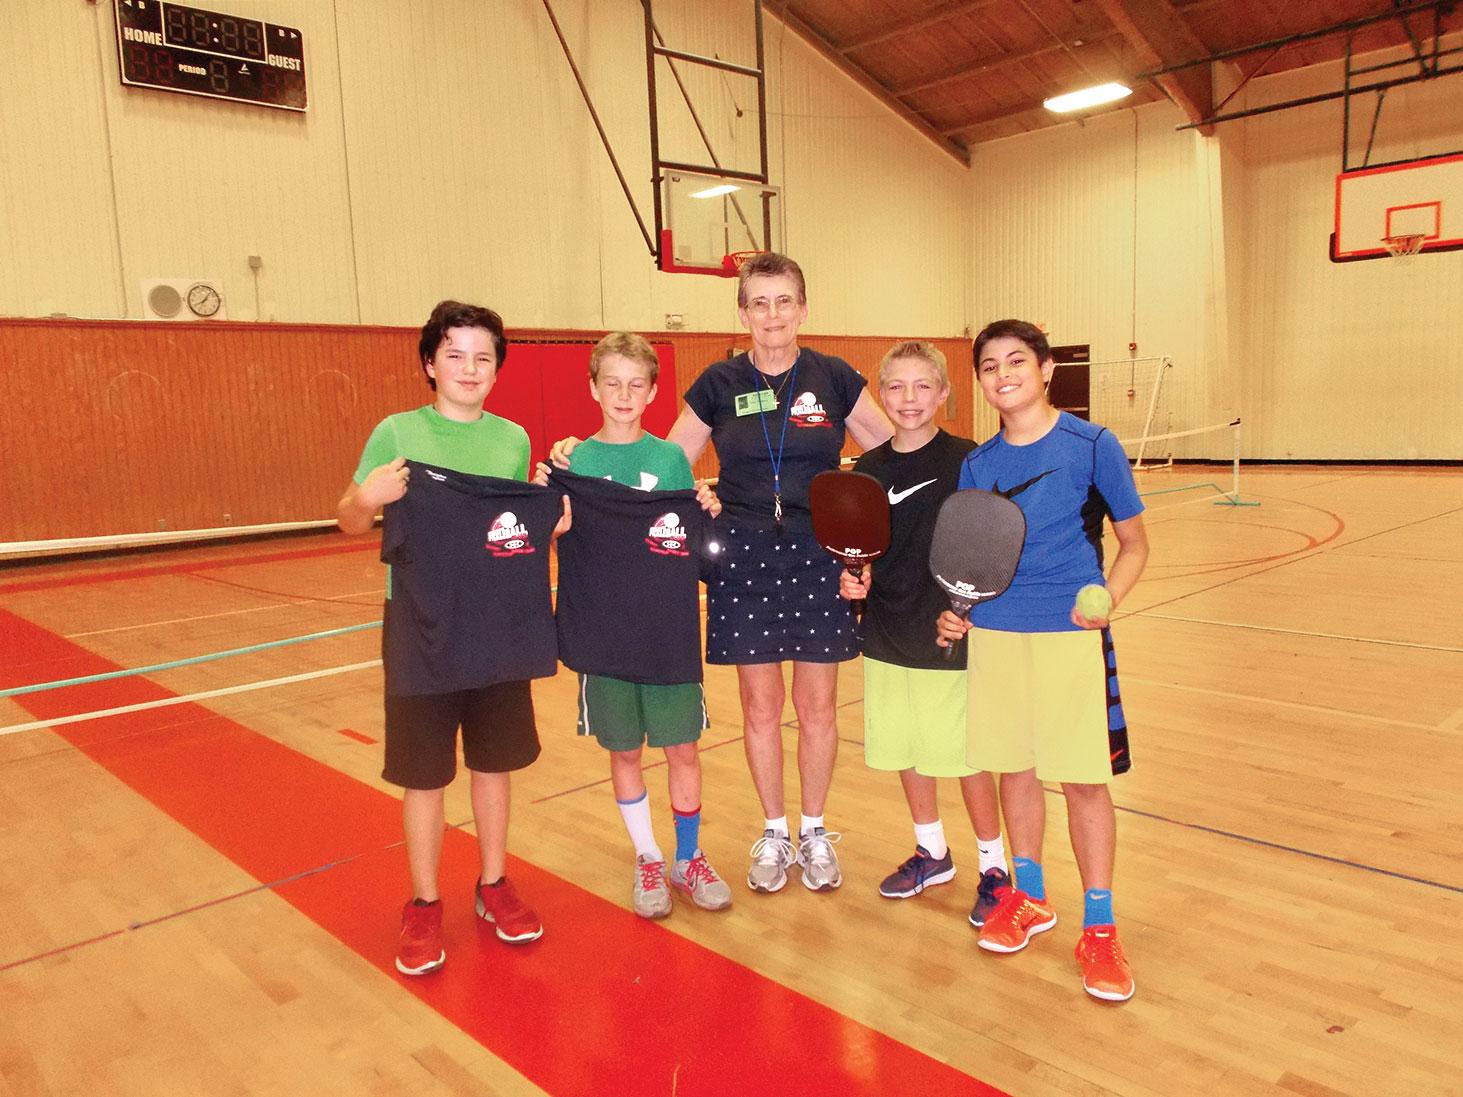 Argyle Intermediate School 5th grade pickleball tournament players